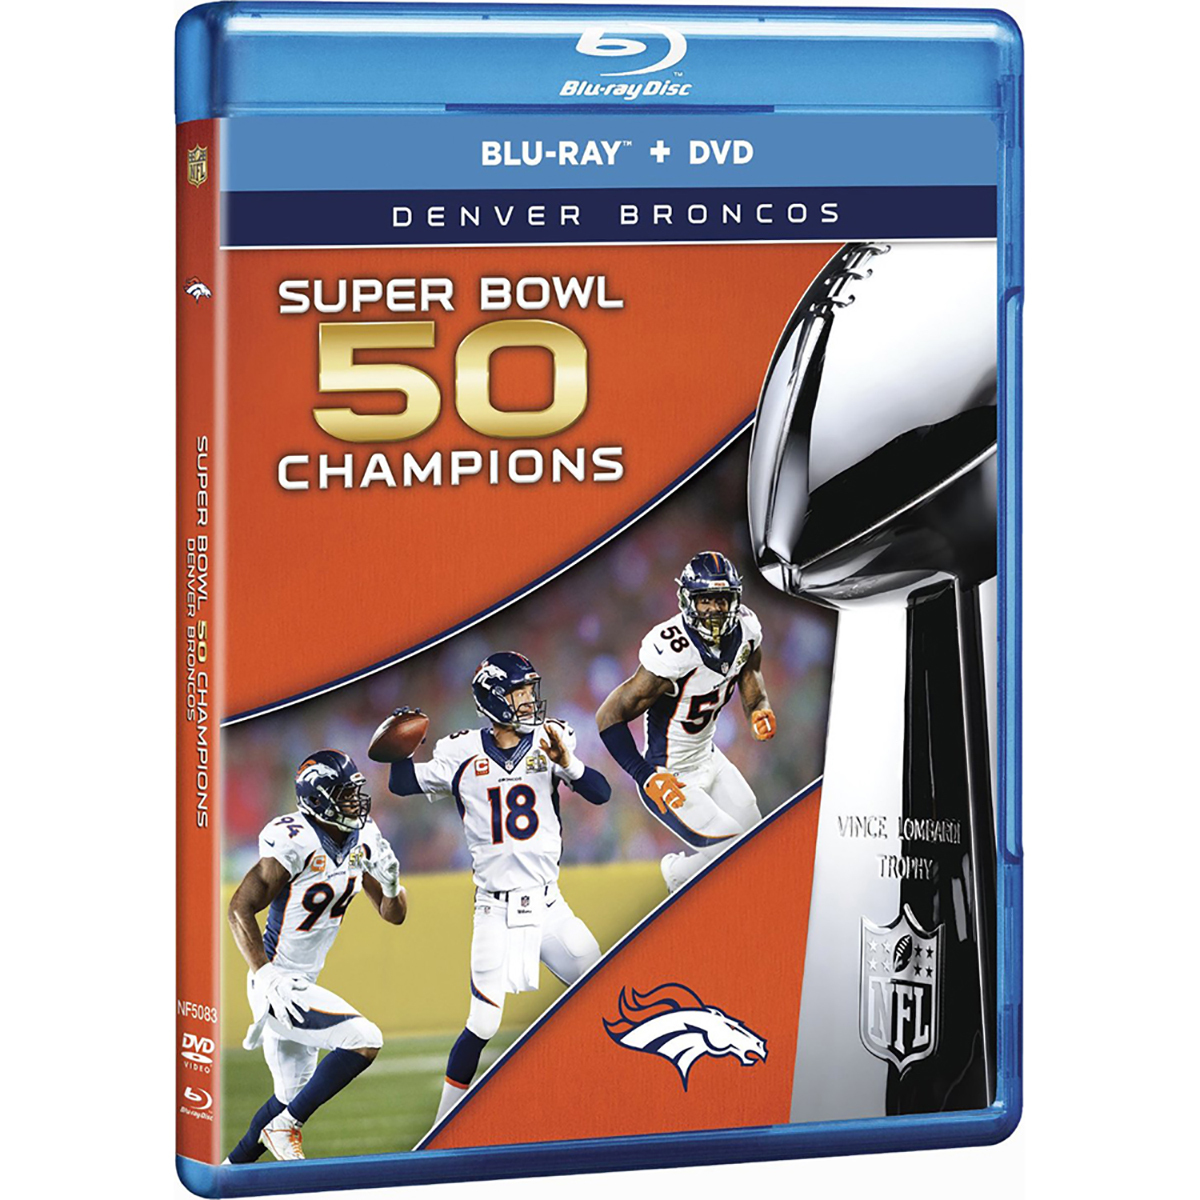 Denver Broncos: Super Bowl 50 Champions (Blu-ray + DVD) -  DVDs & Videos 3524-981067